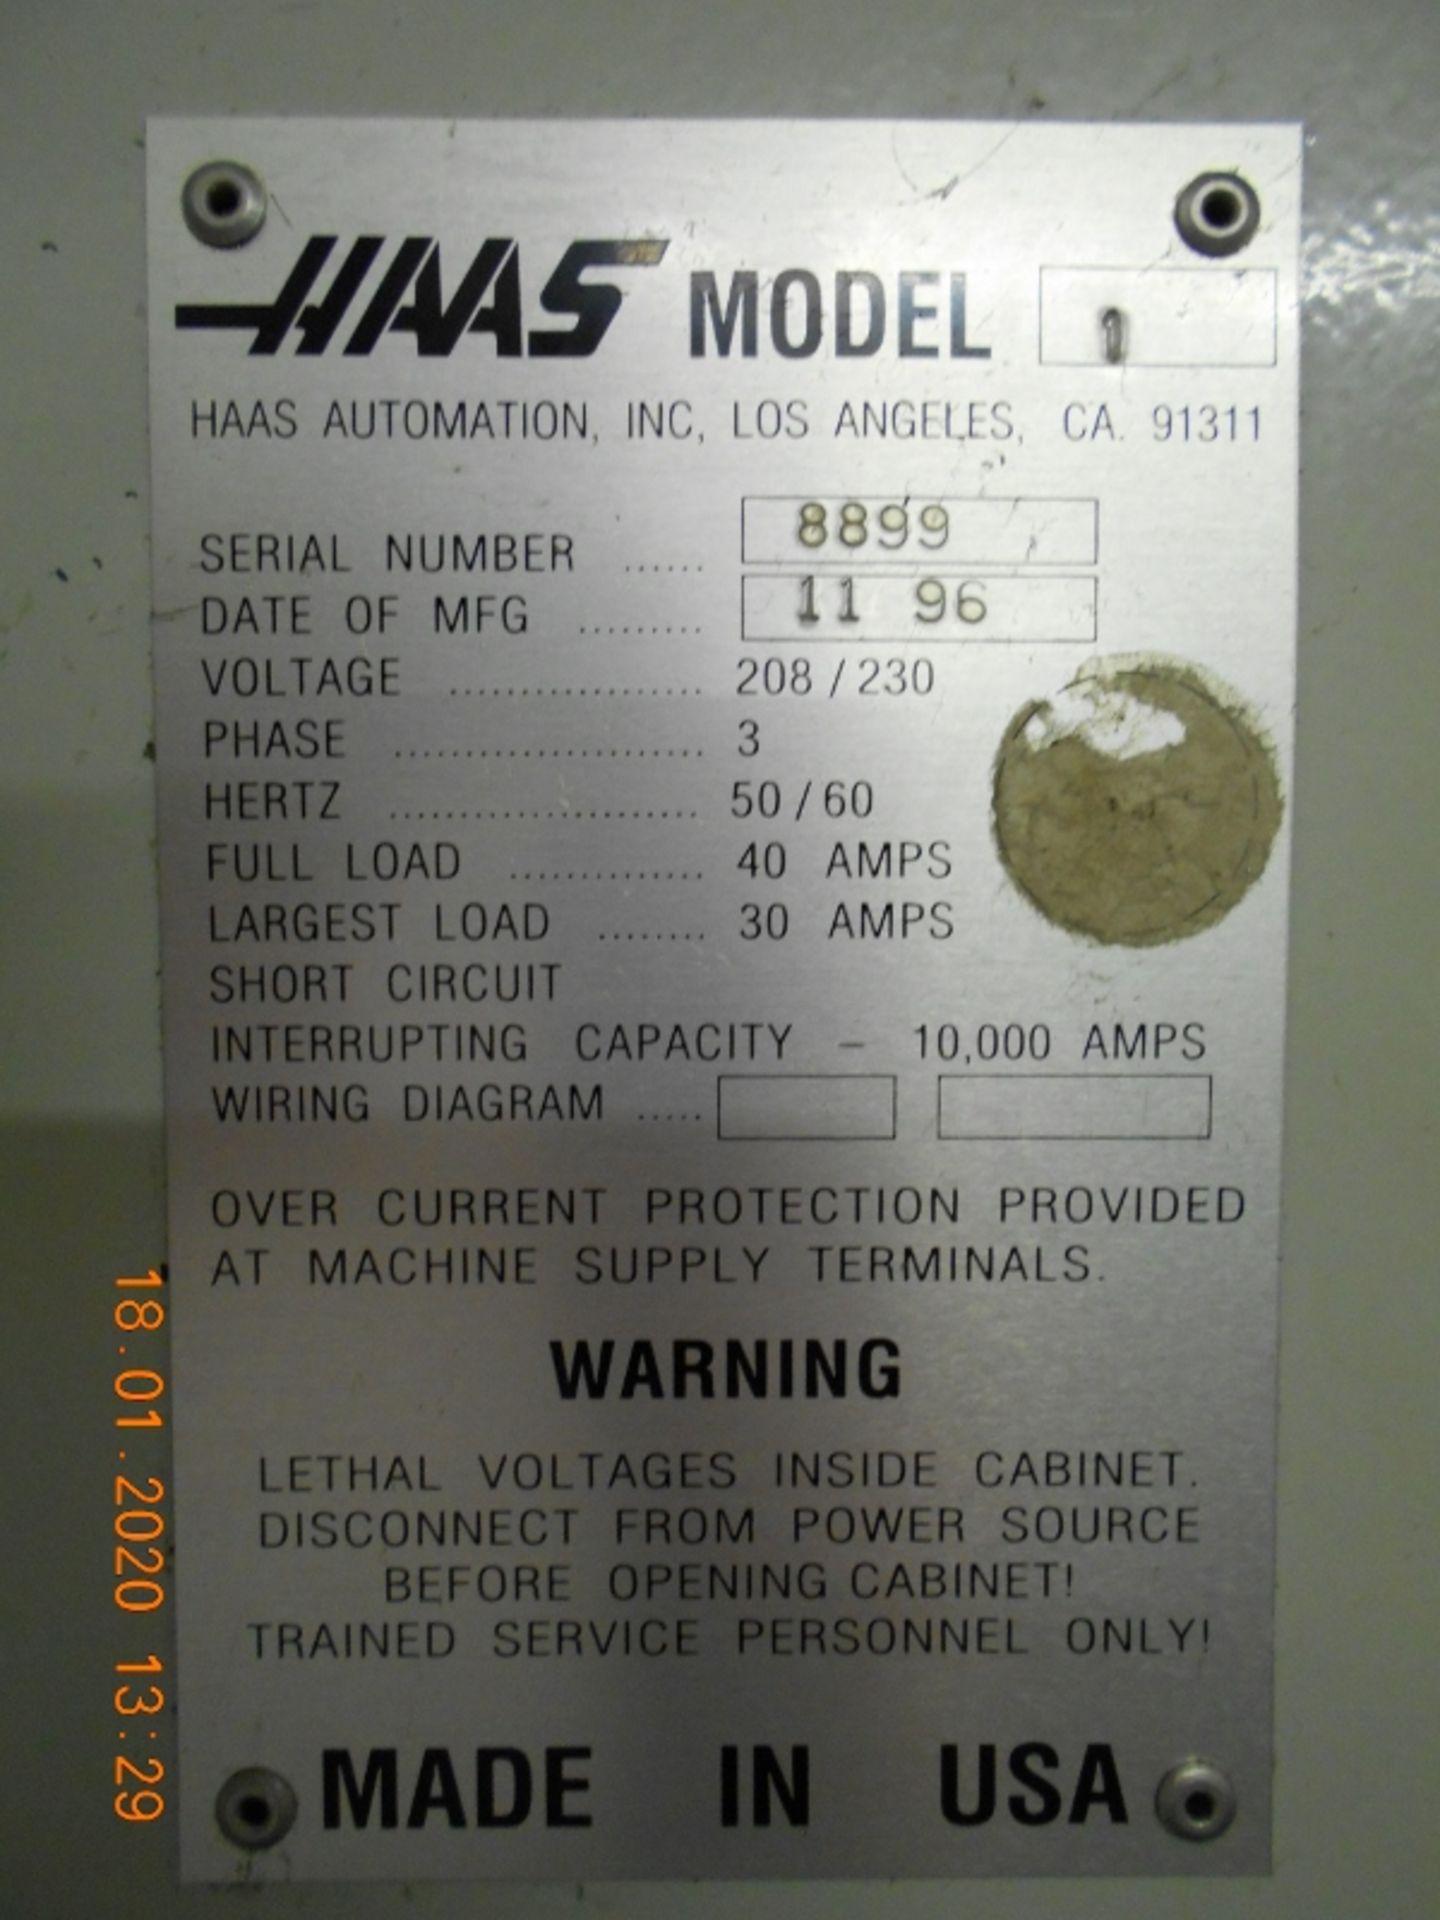 Lot 3 - Haas CNC Vertical Machining Center (VMC) VF-1 Serial #8899